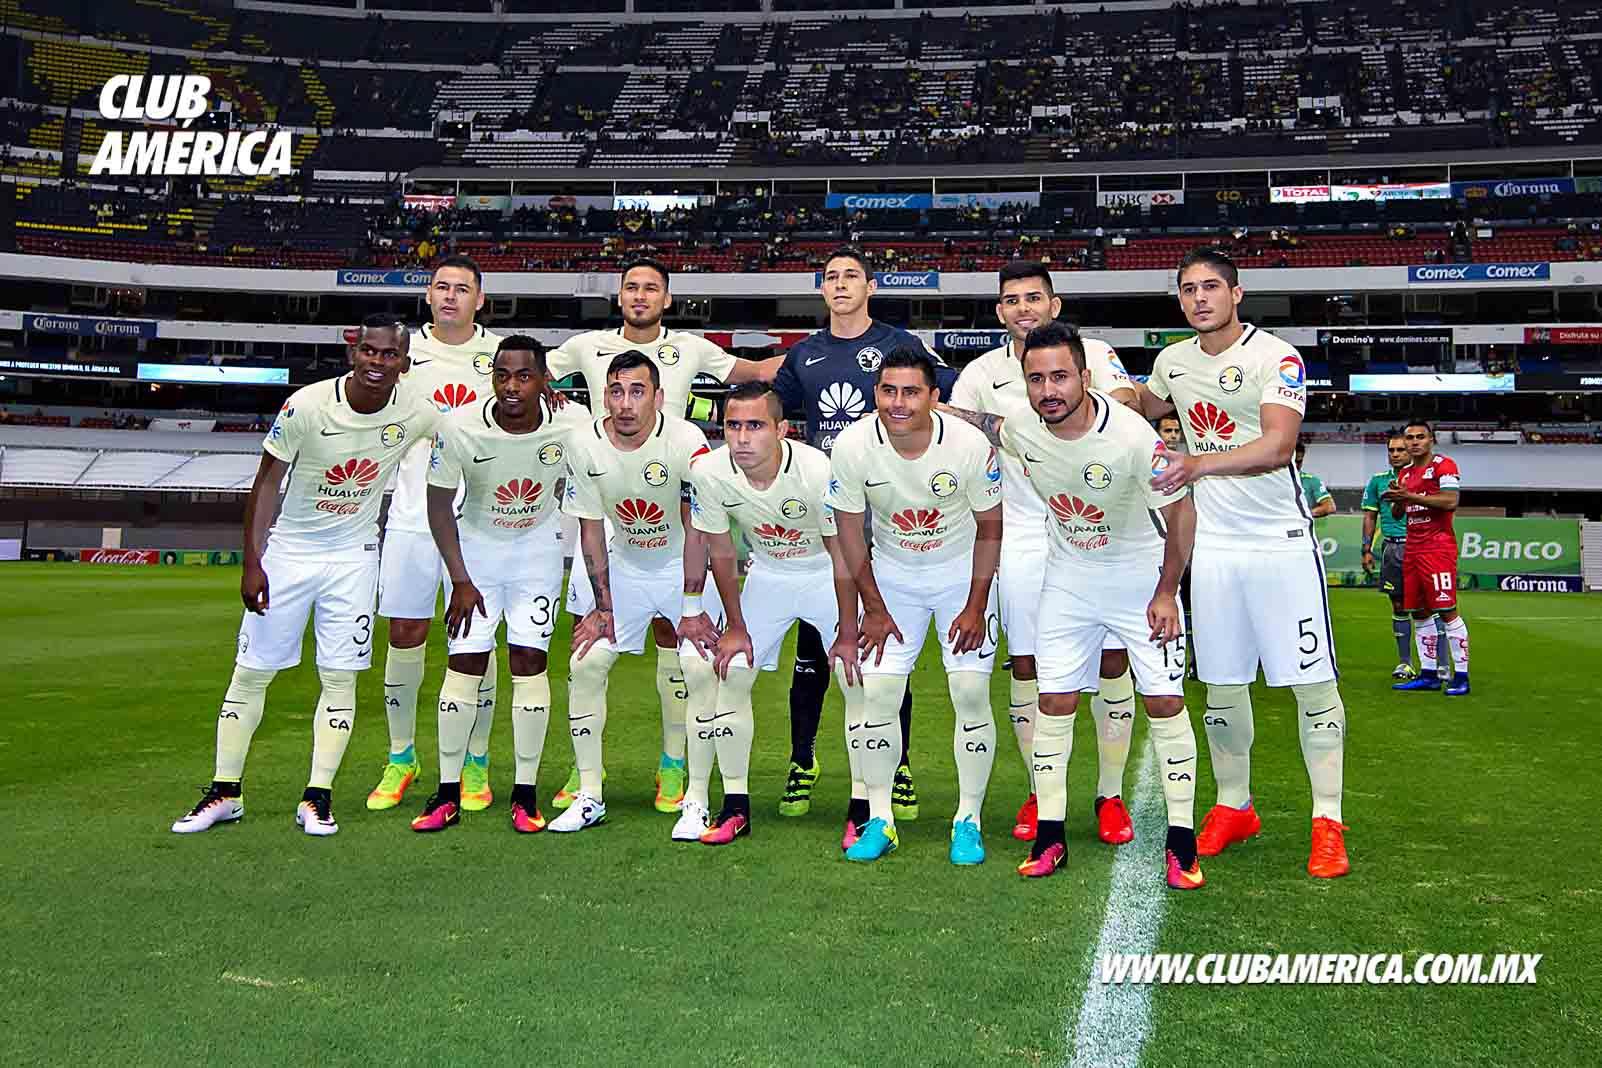 http://www.clubamerica.com.mx/portal/wp-content/uploads/2016/07/CFA_8815.jpg